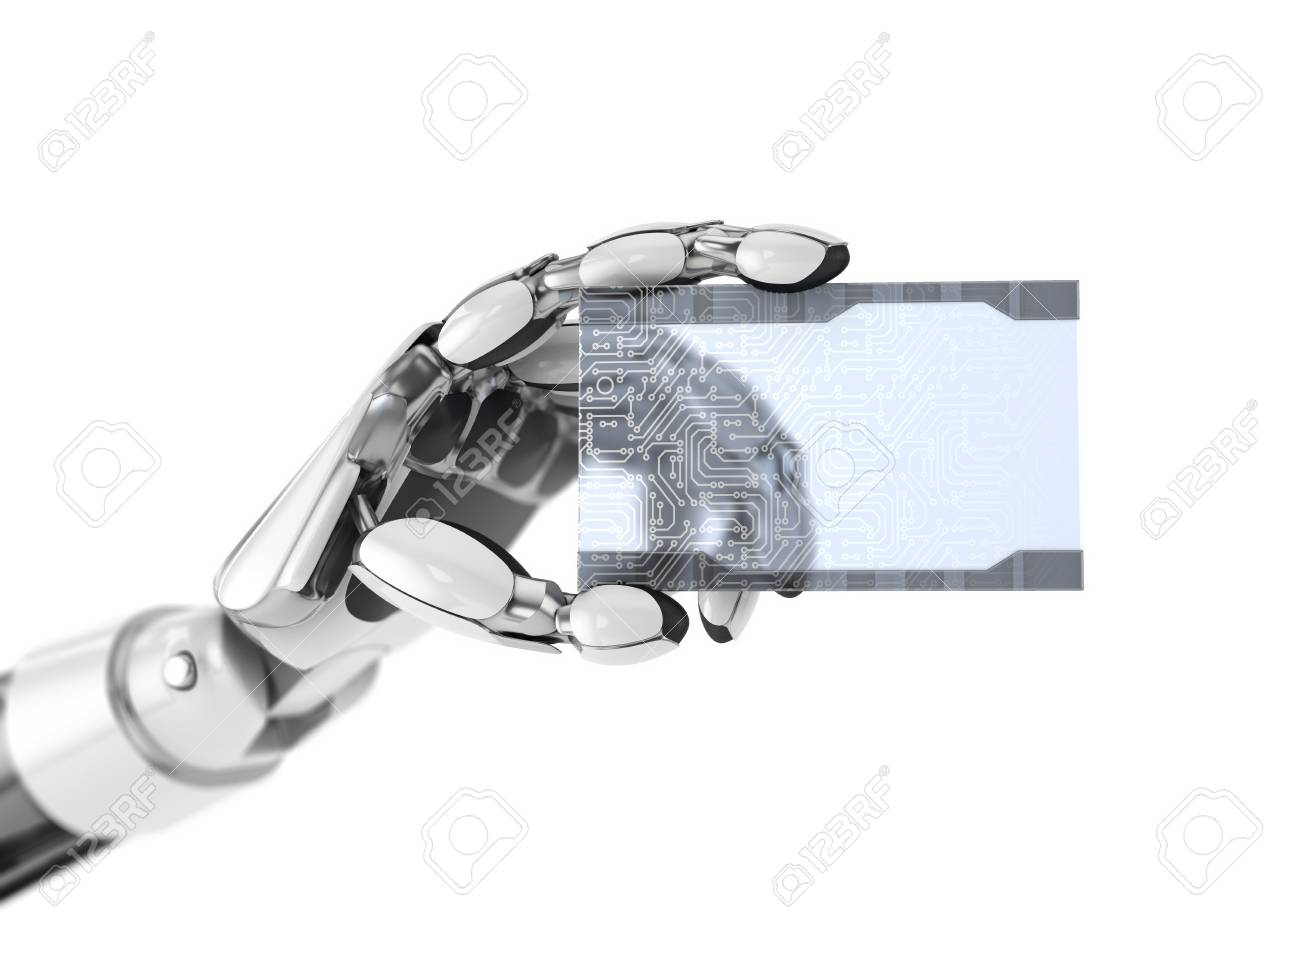 Robotics Arm Gives A Empty Digital Business Card Artificial Stock